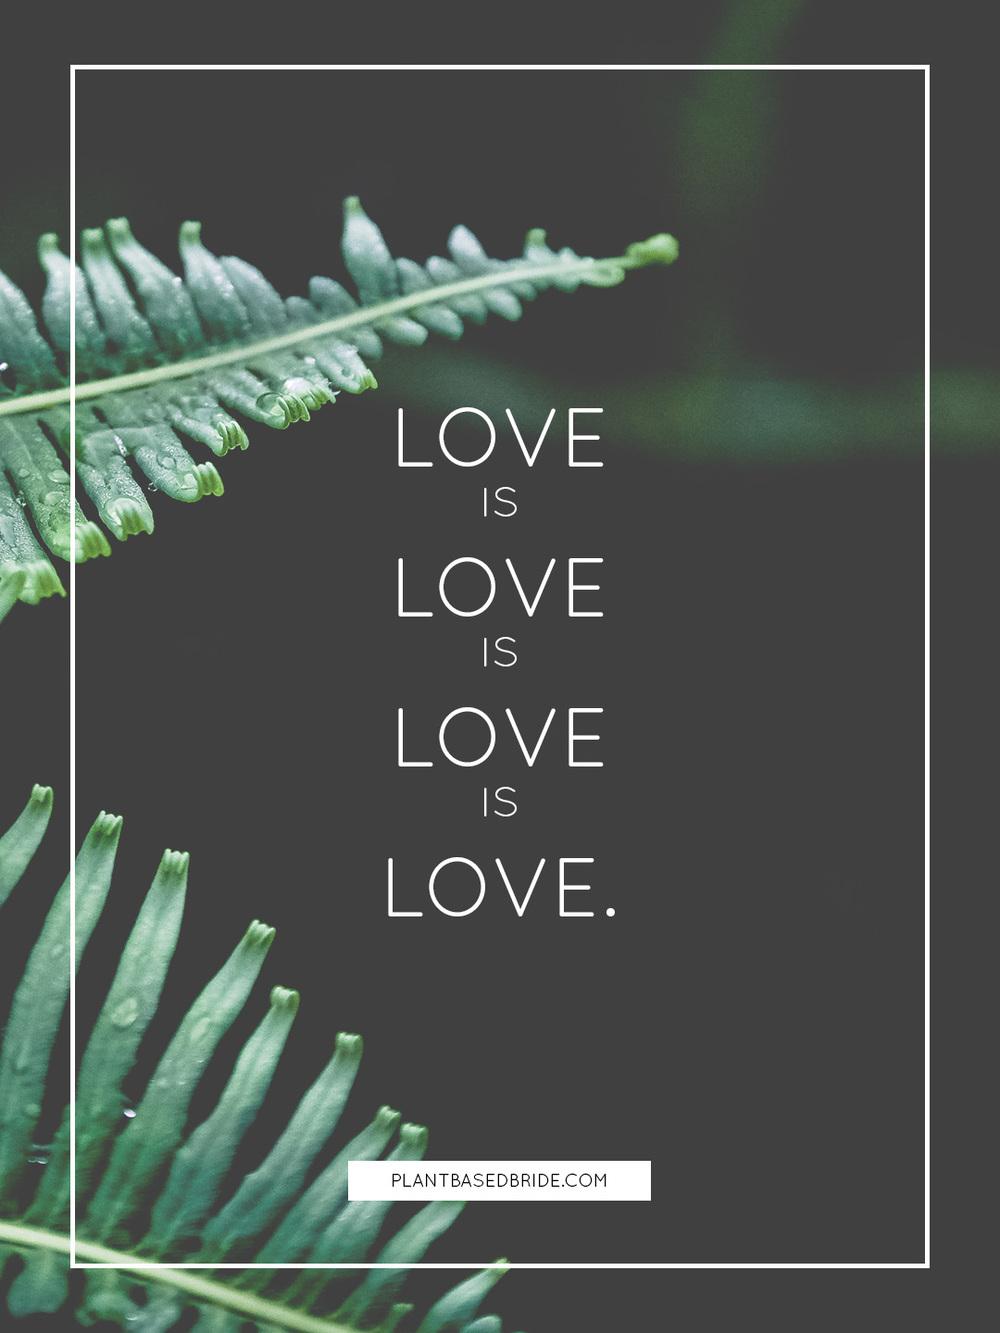 Love is love is love is love.  // Plant Based Bride